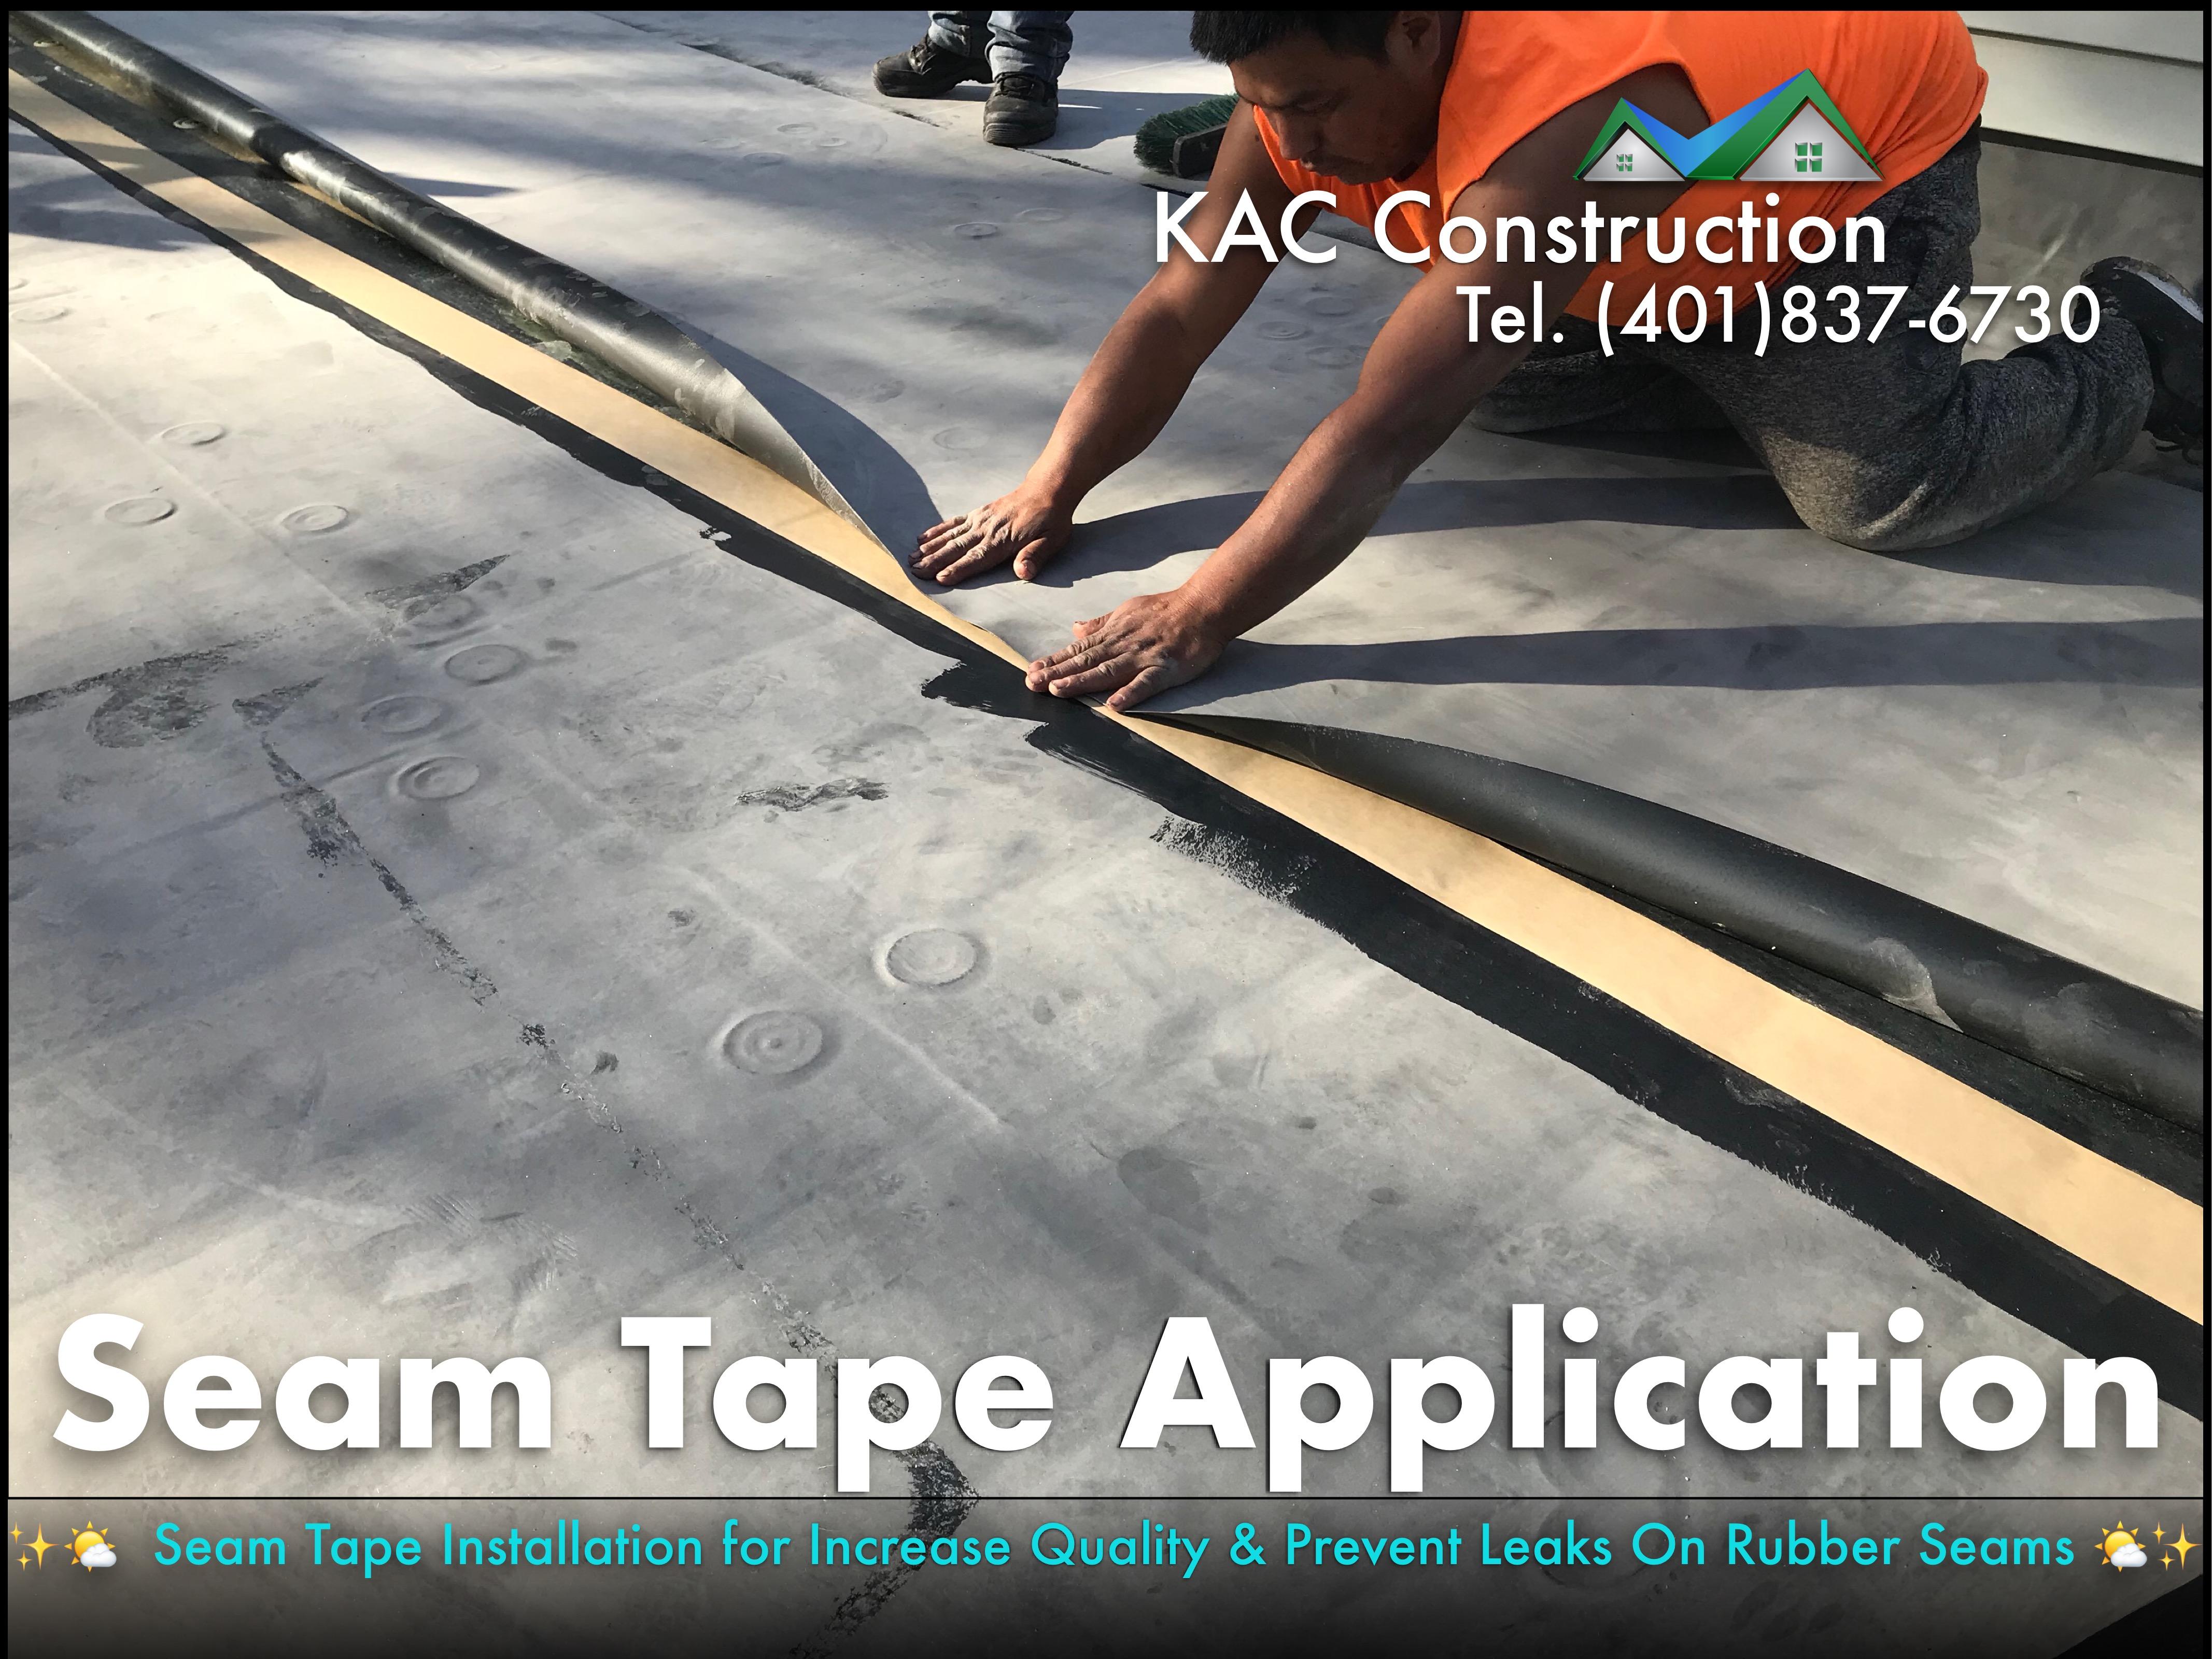 Best rubber roof, Best rubber roof ri, Best rubber roof contractor, Best rubber roof contractor ri, Best rubber roof contractor in RI, best rubber, Best rubber roofing RI, best rubber roofing contractor ri